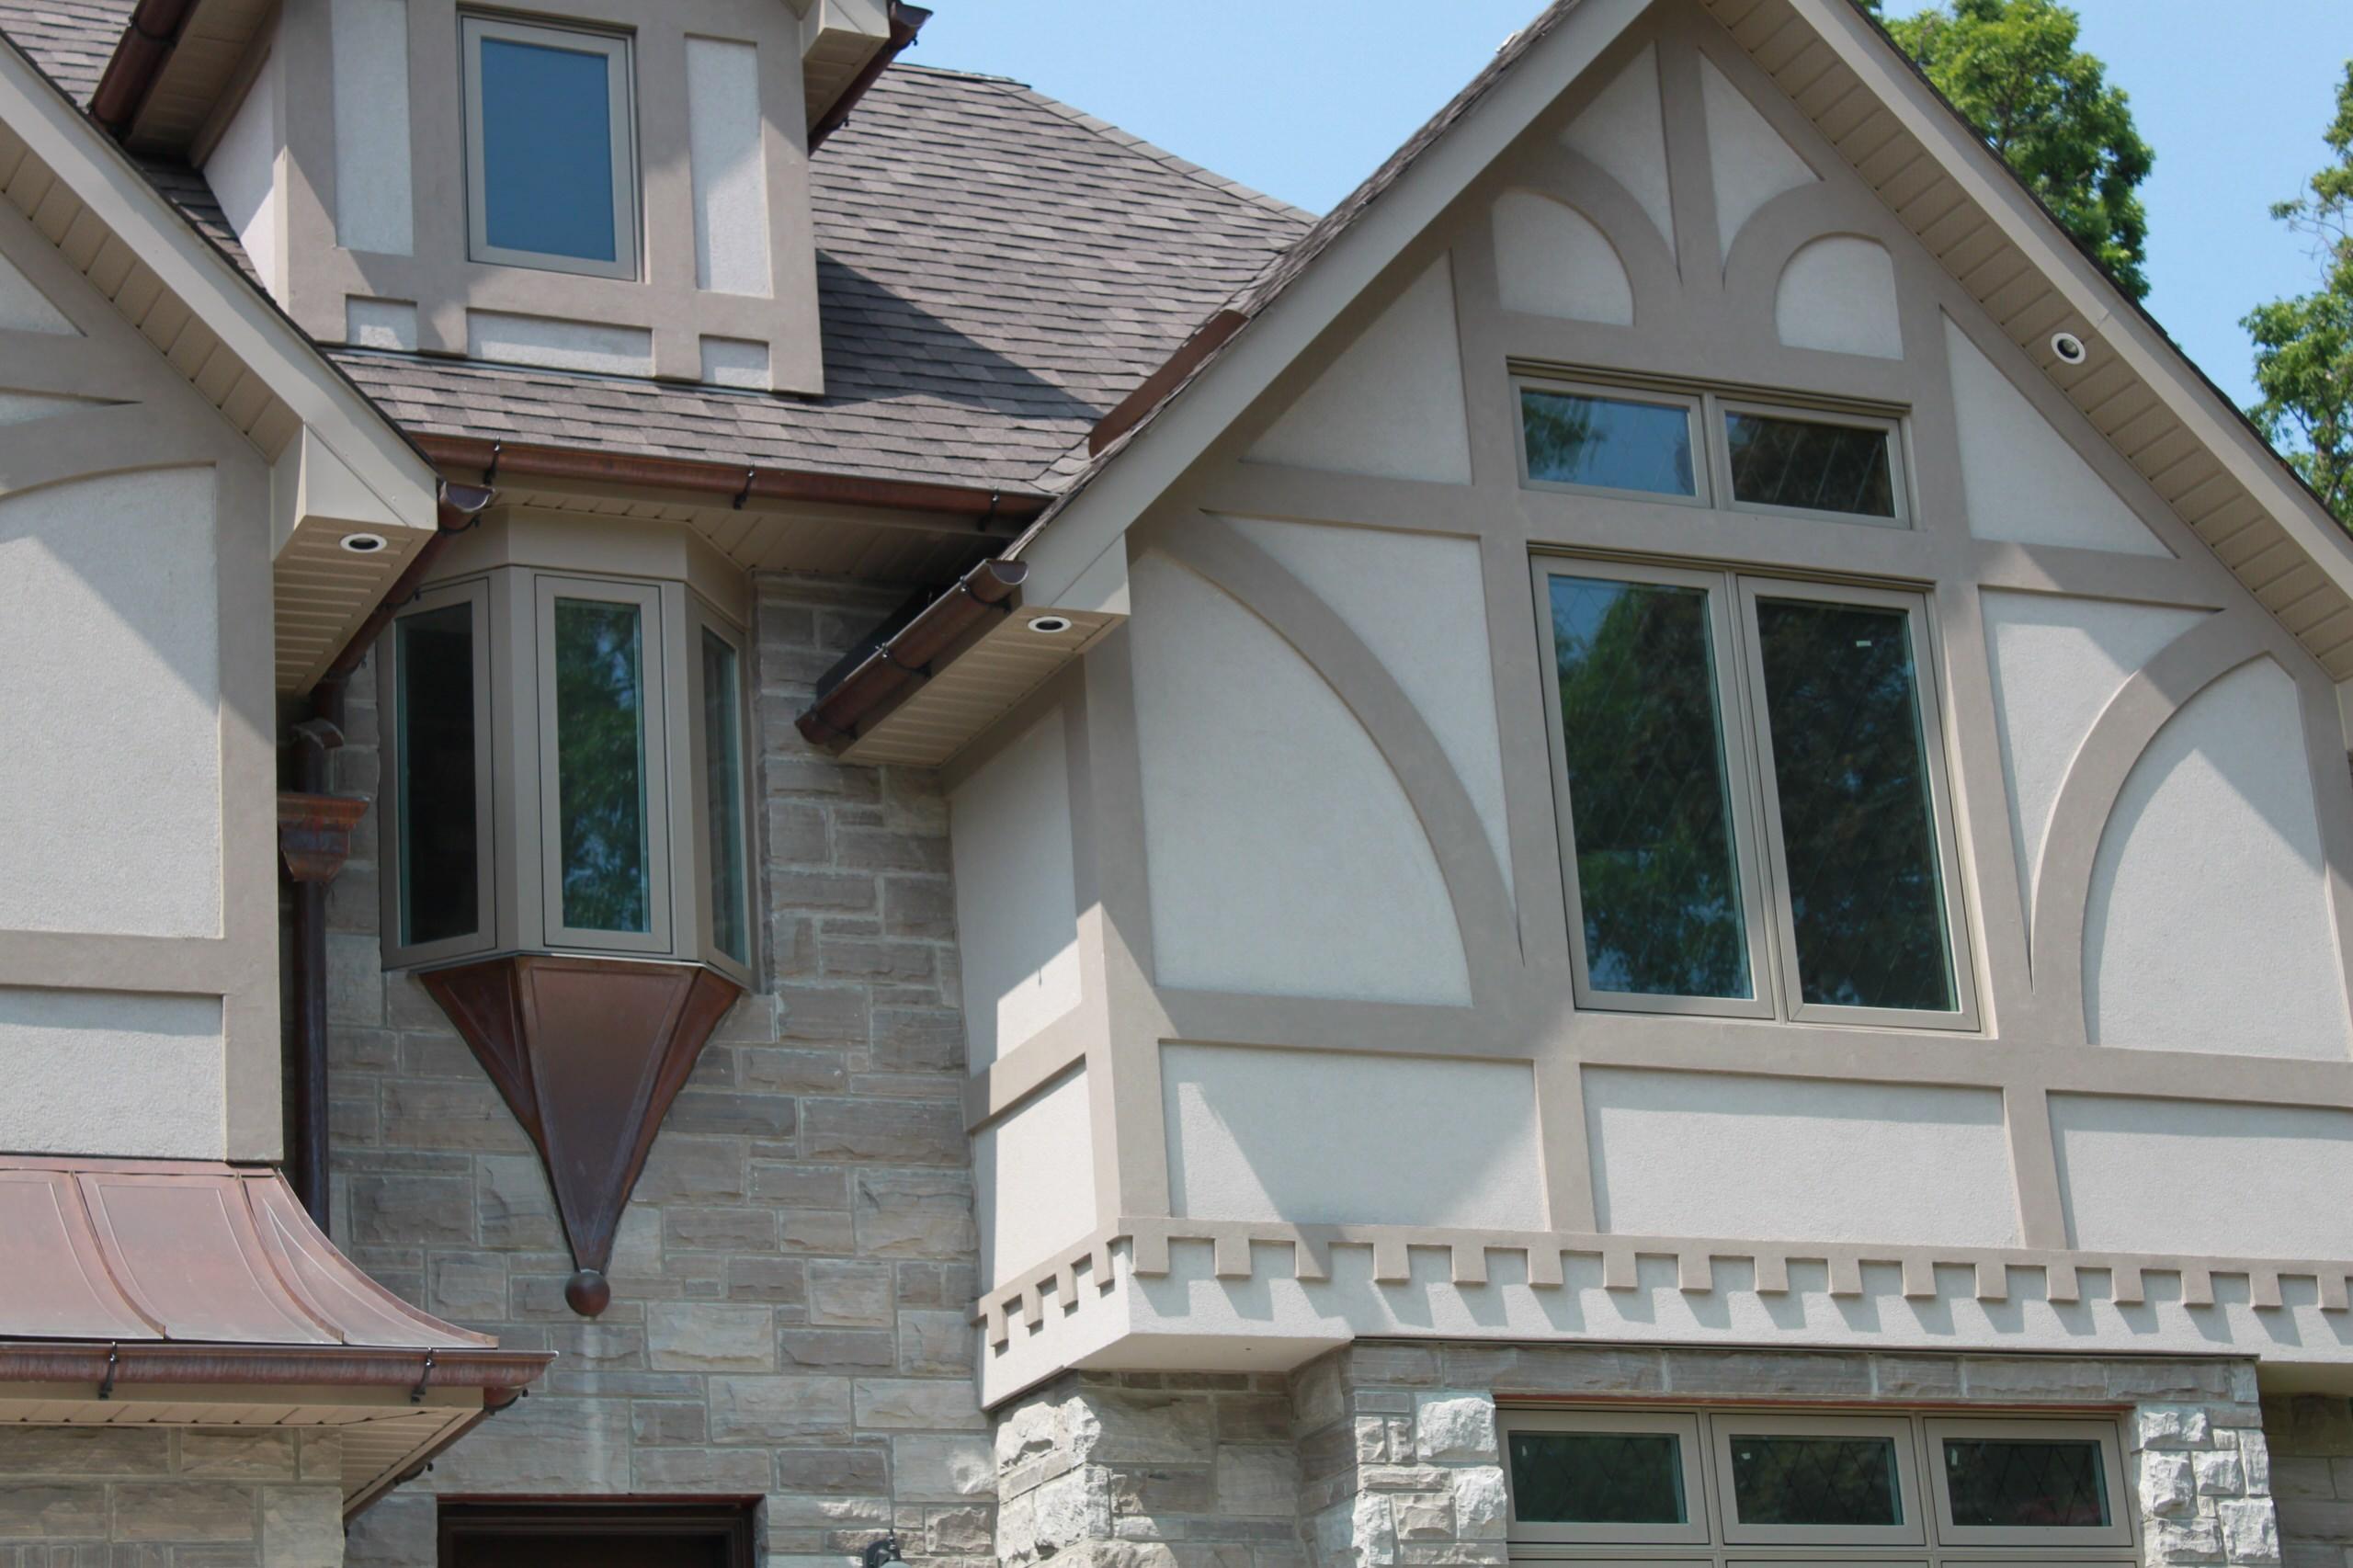 Chestnut Hills Tudor Style